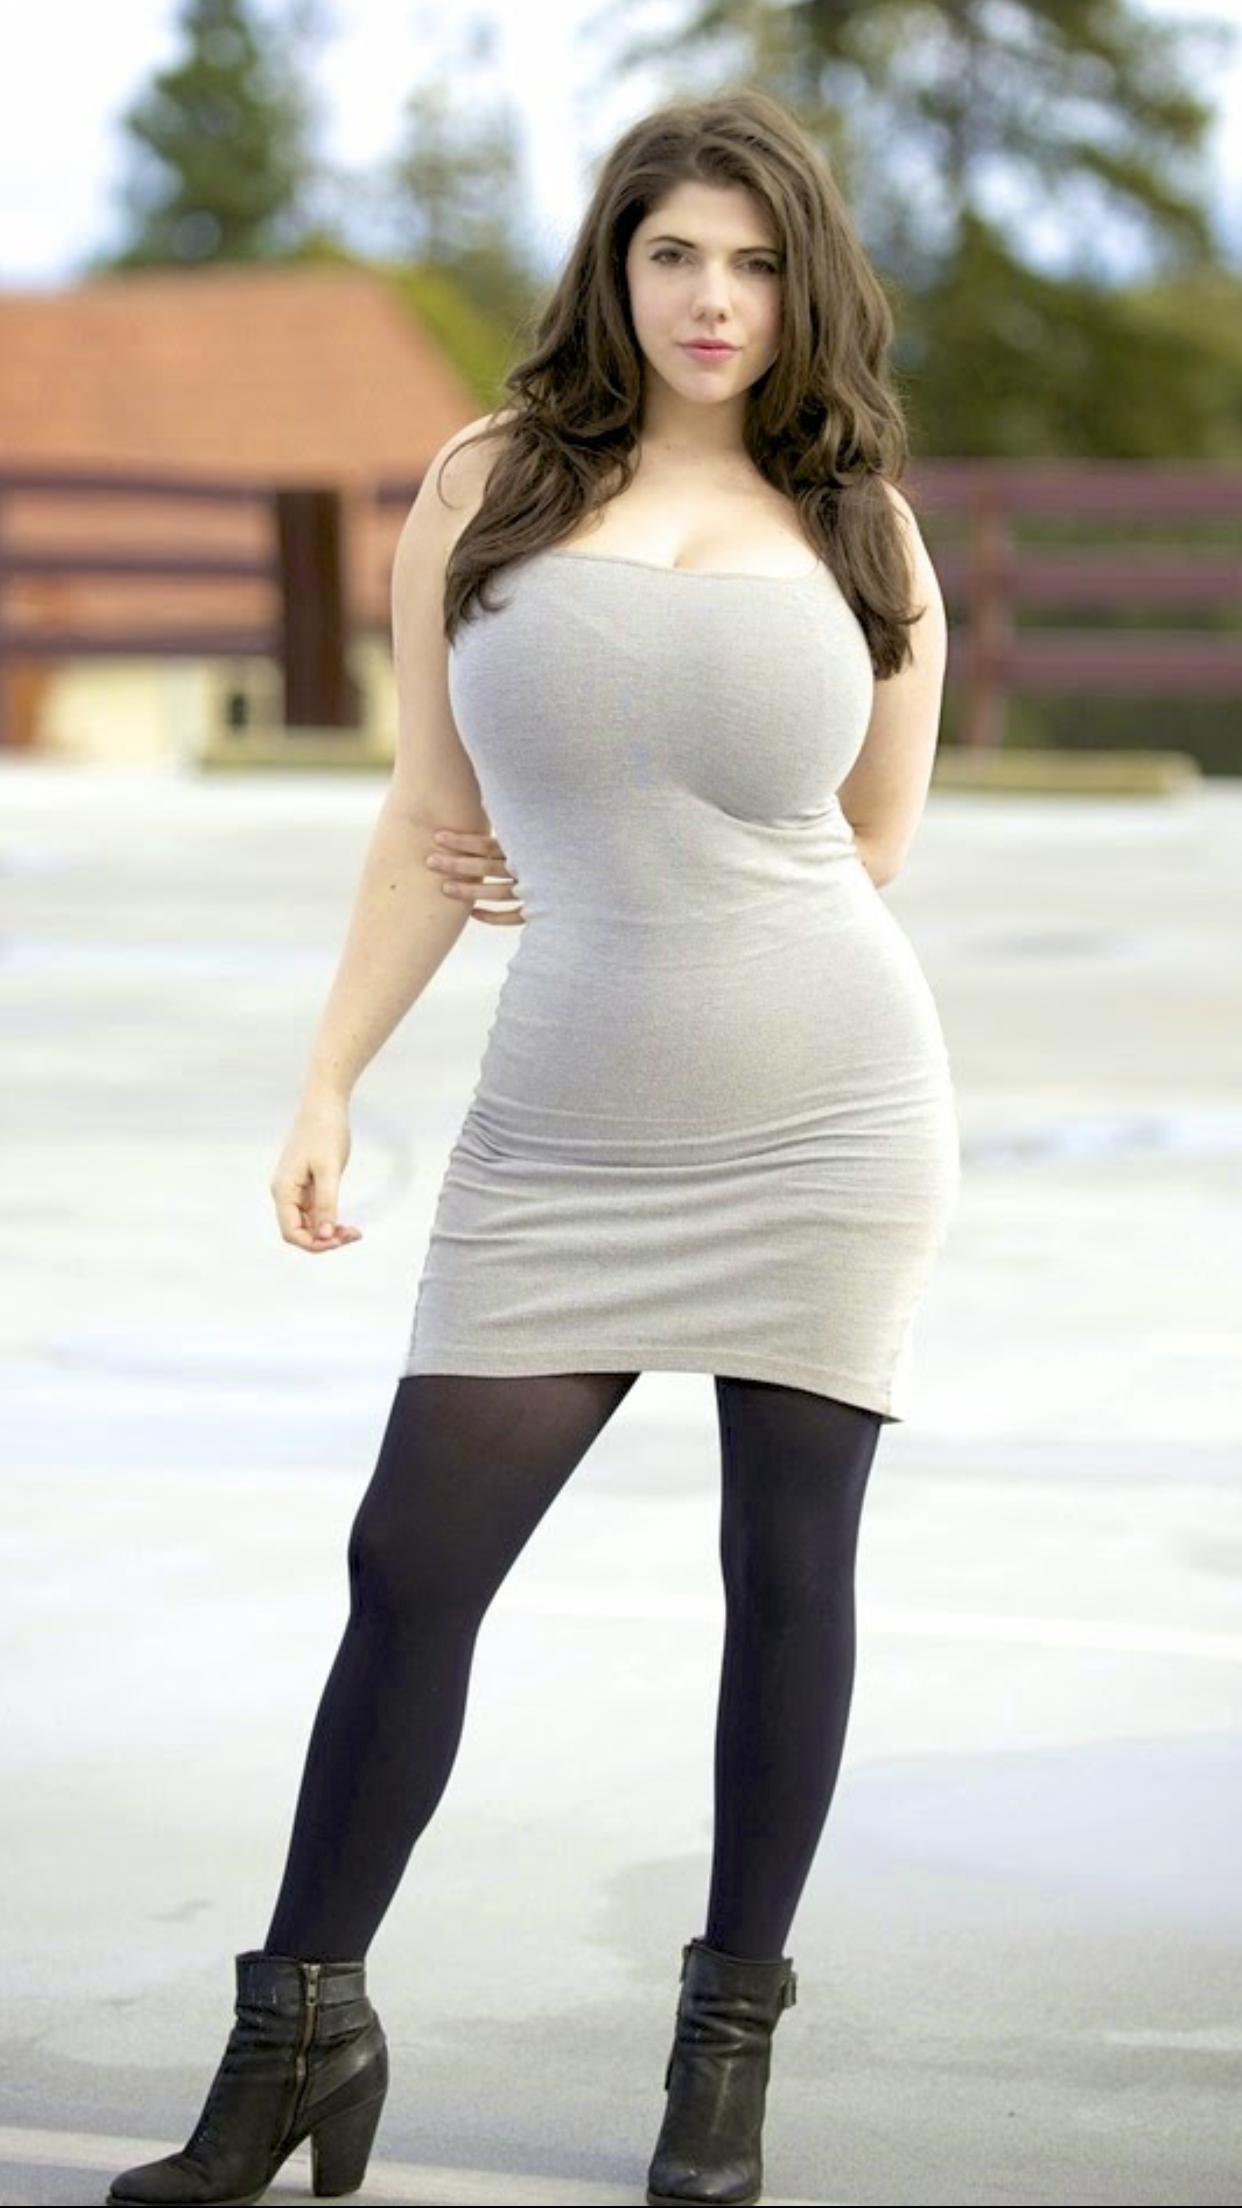 nude-tight-women-curvy-most-cum-on-a-girl